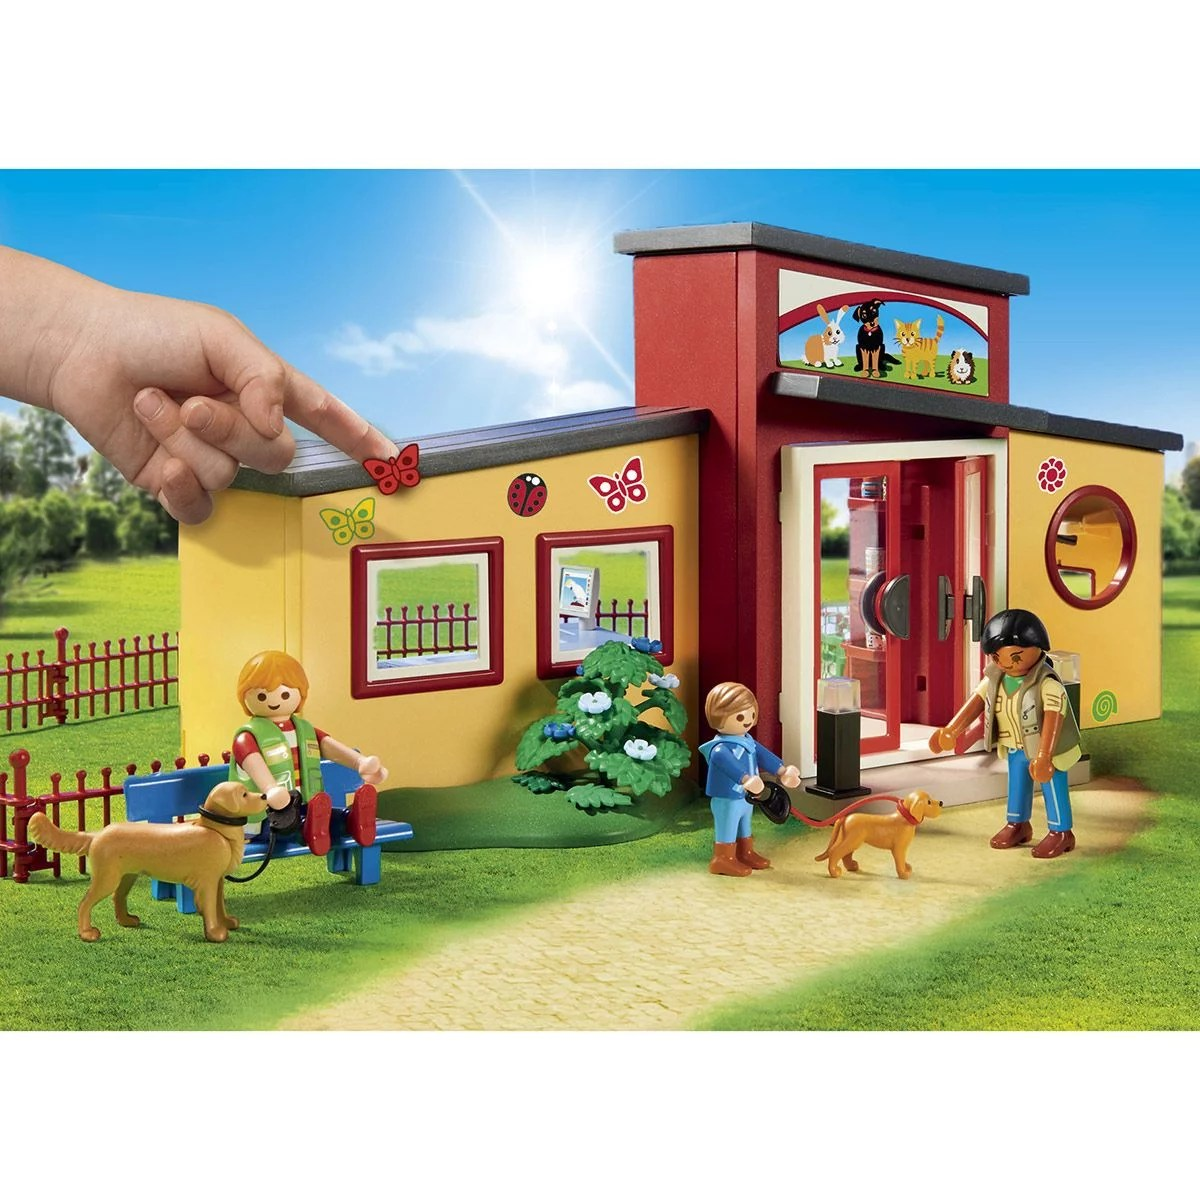 pension des animaux playmobil city life 9275